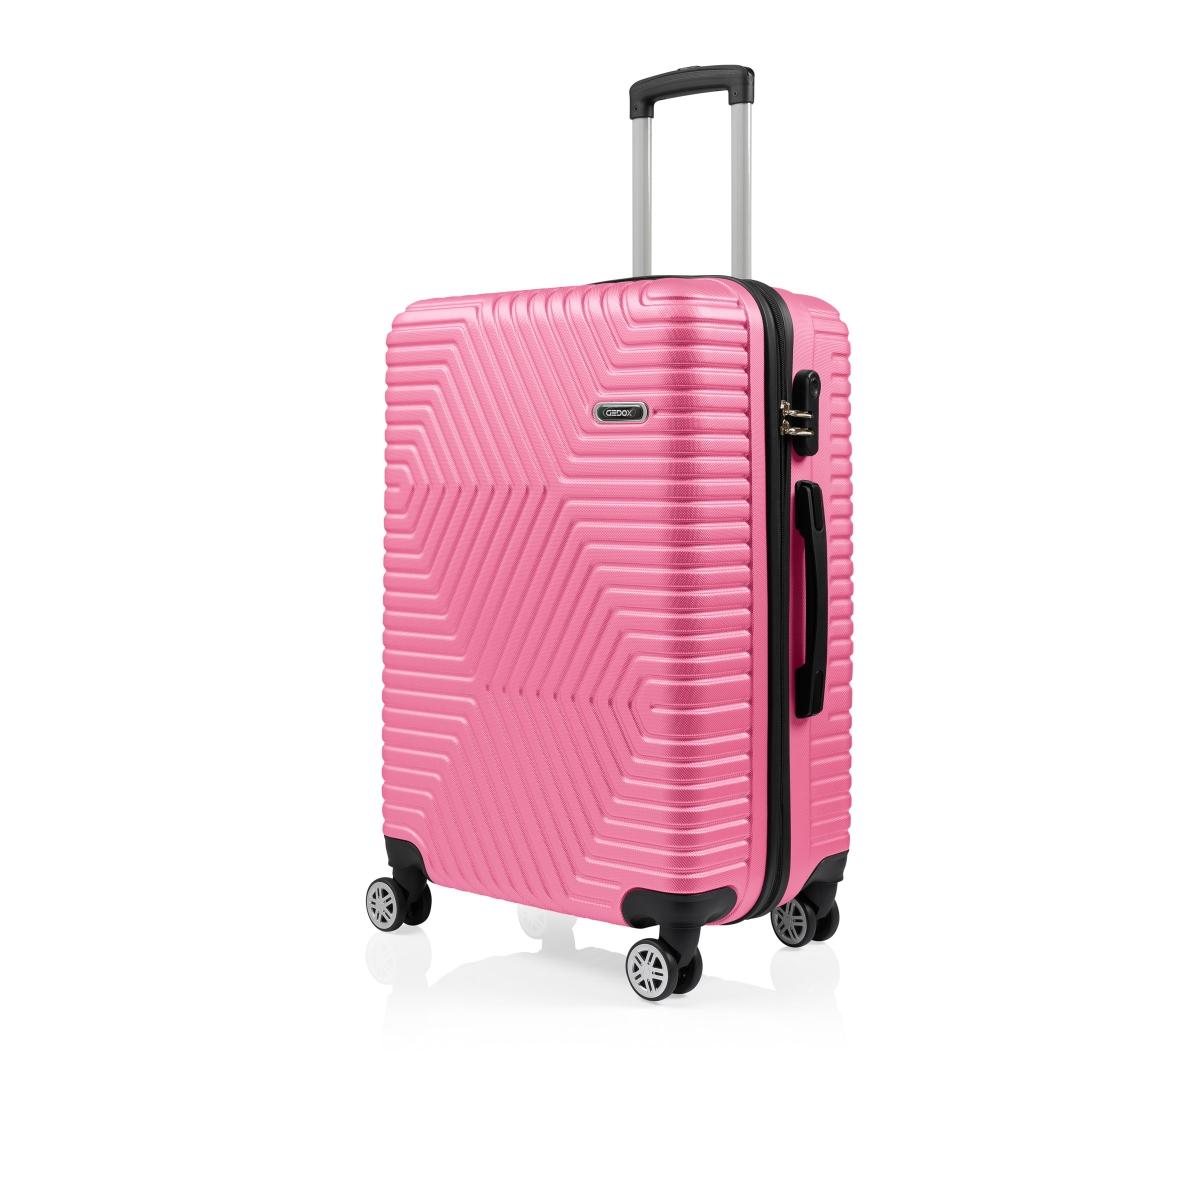 G&D Polo Suitcase ABS 3'lü Lüx Valiz Seyahat Seti - Model:600.11 Pudra Pembe